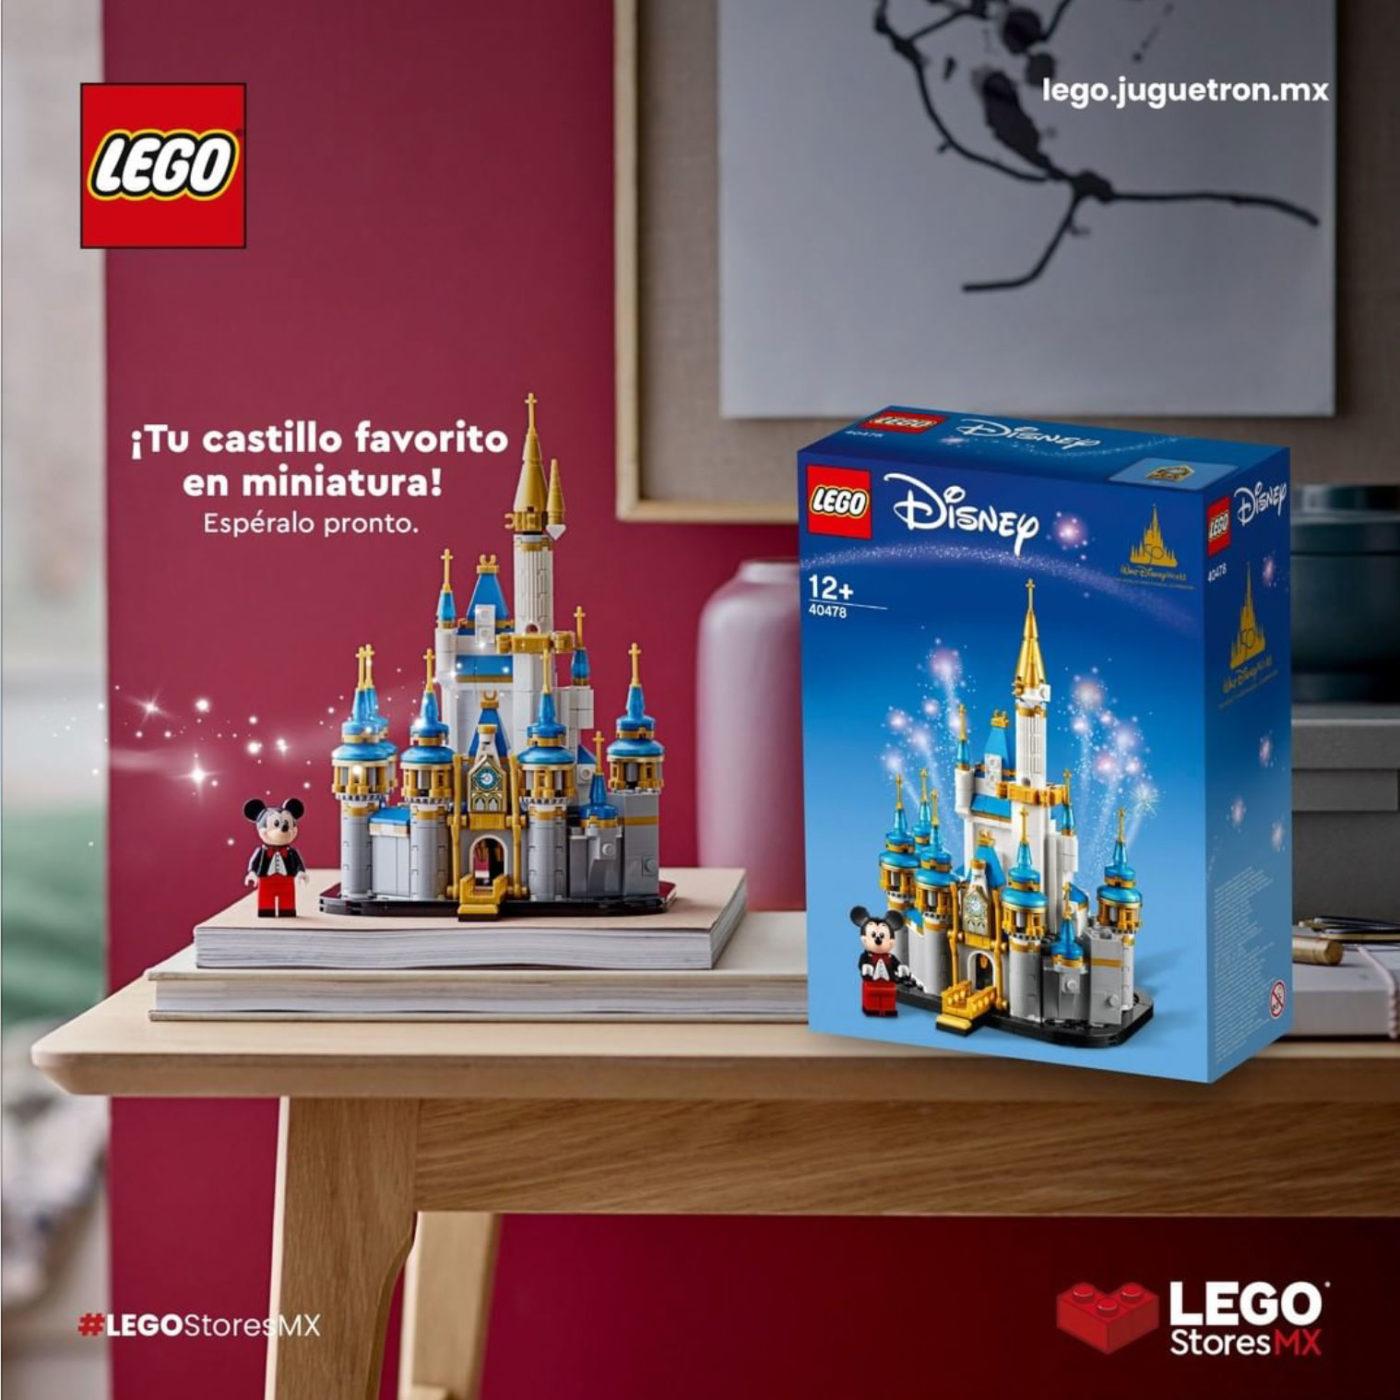 LEGO 40478 Mini Disney Castle LEGO Mexio Instagram